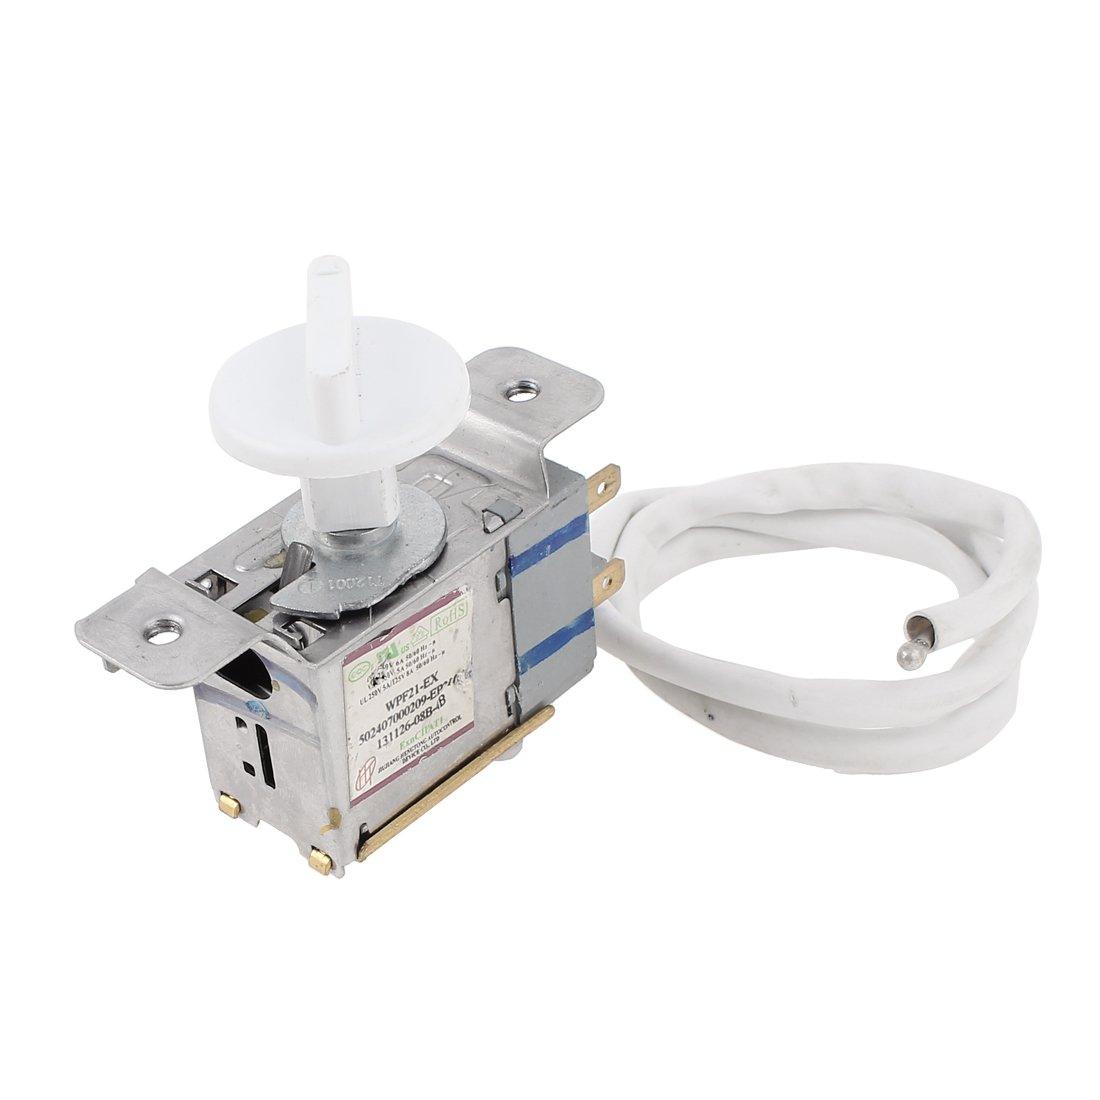 Fridge Freezer Thermostat Vt9 Kit Temperature Control